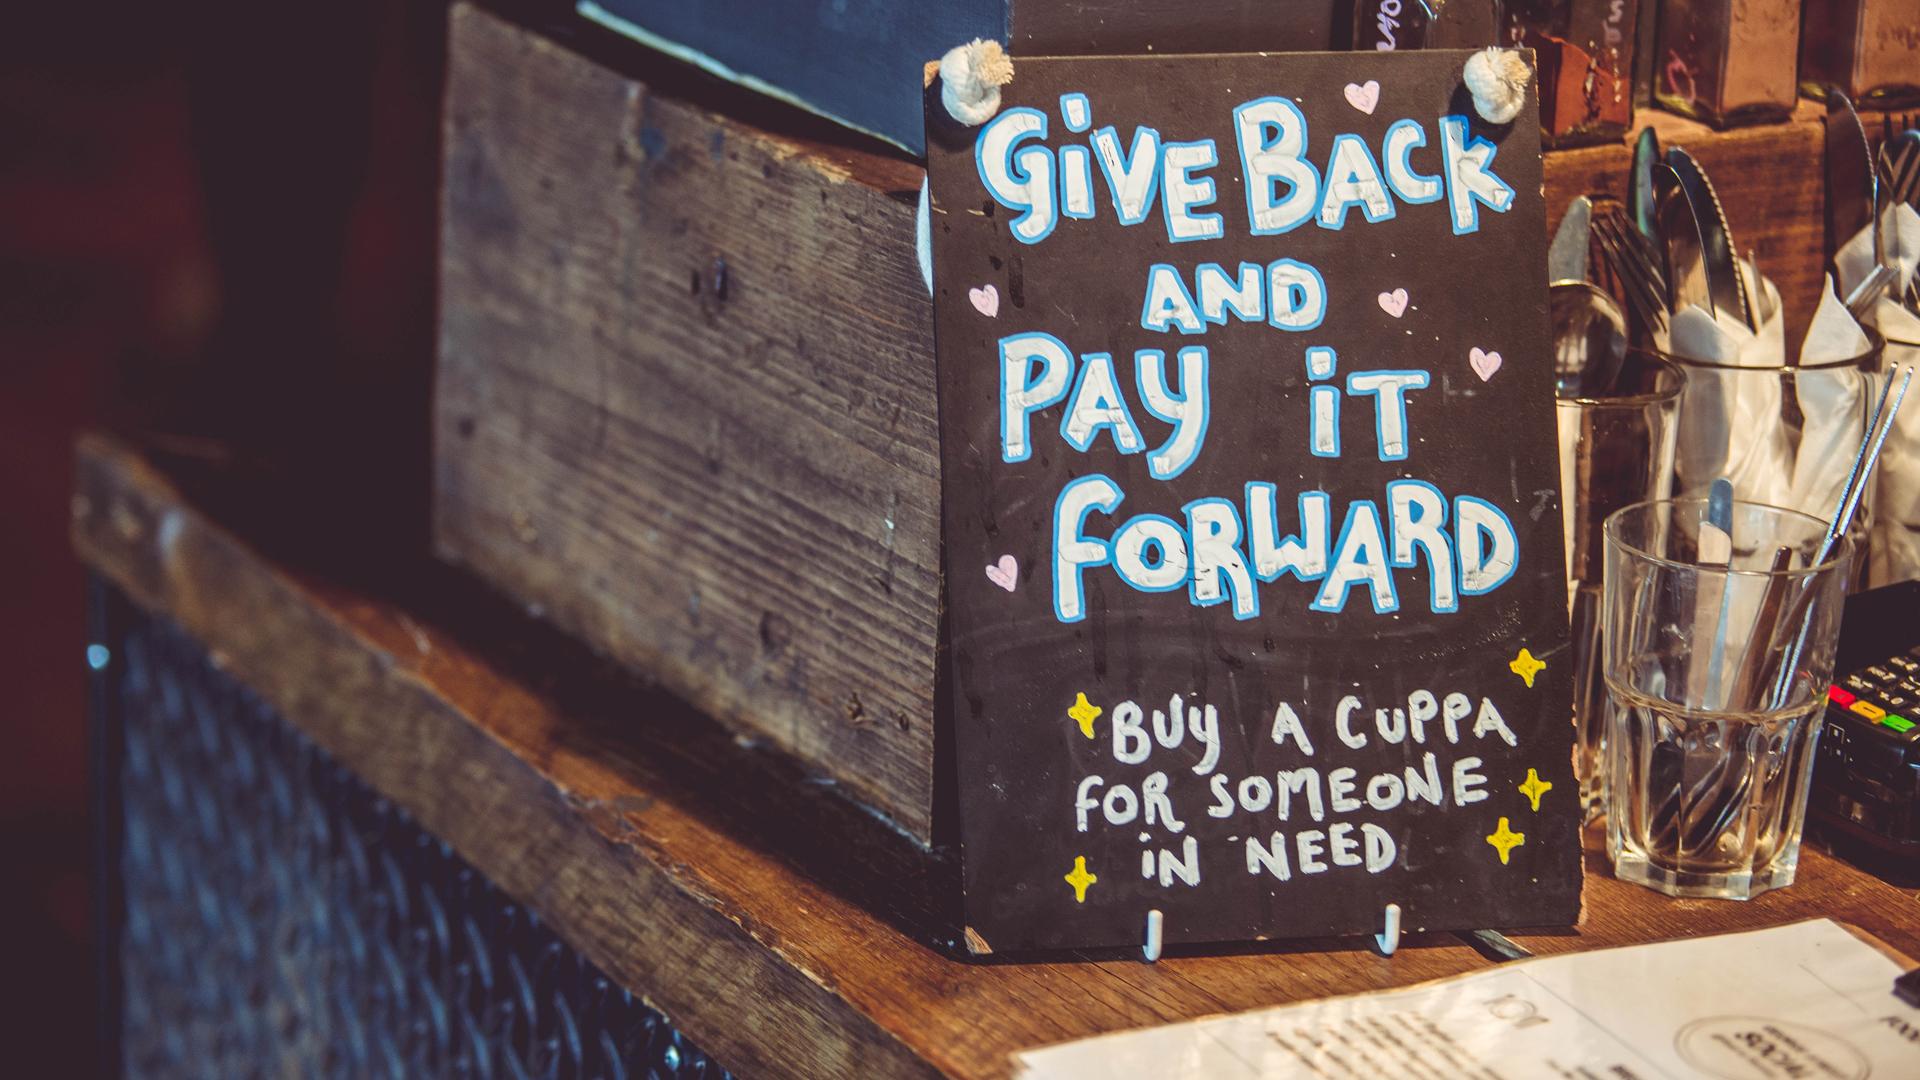 Pay-It-Forward.jpg